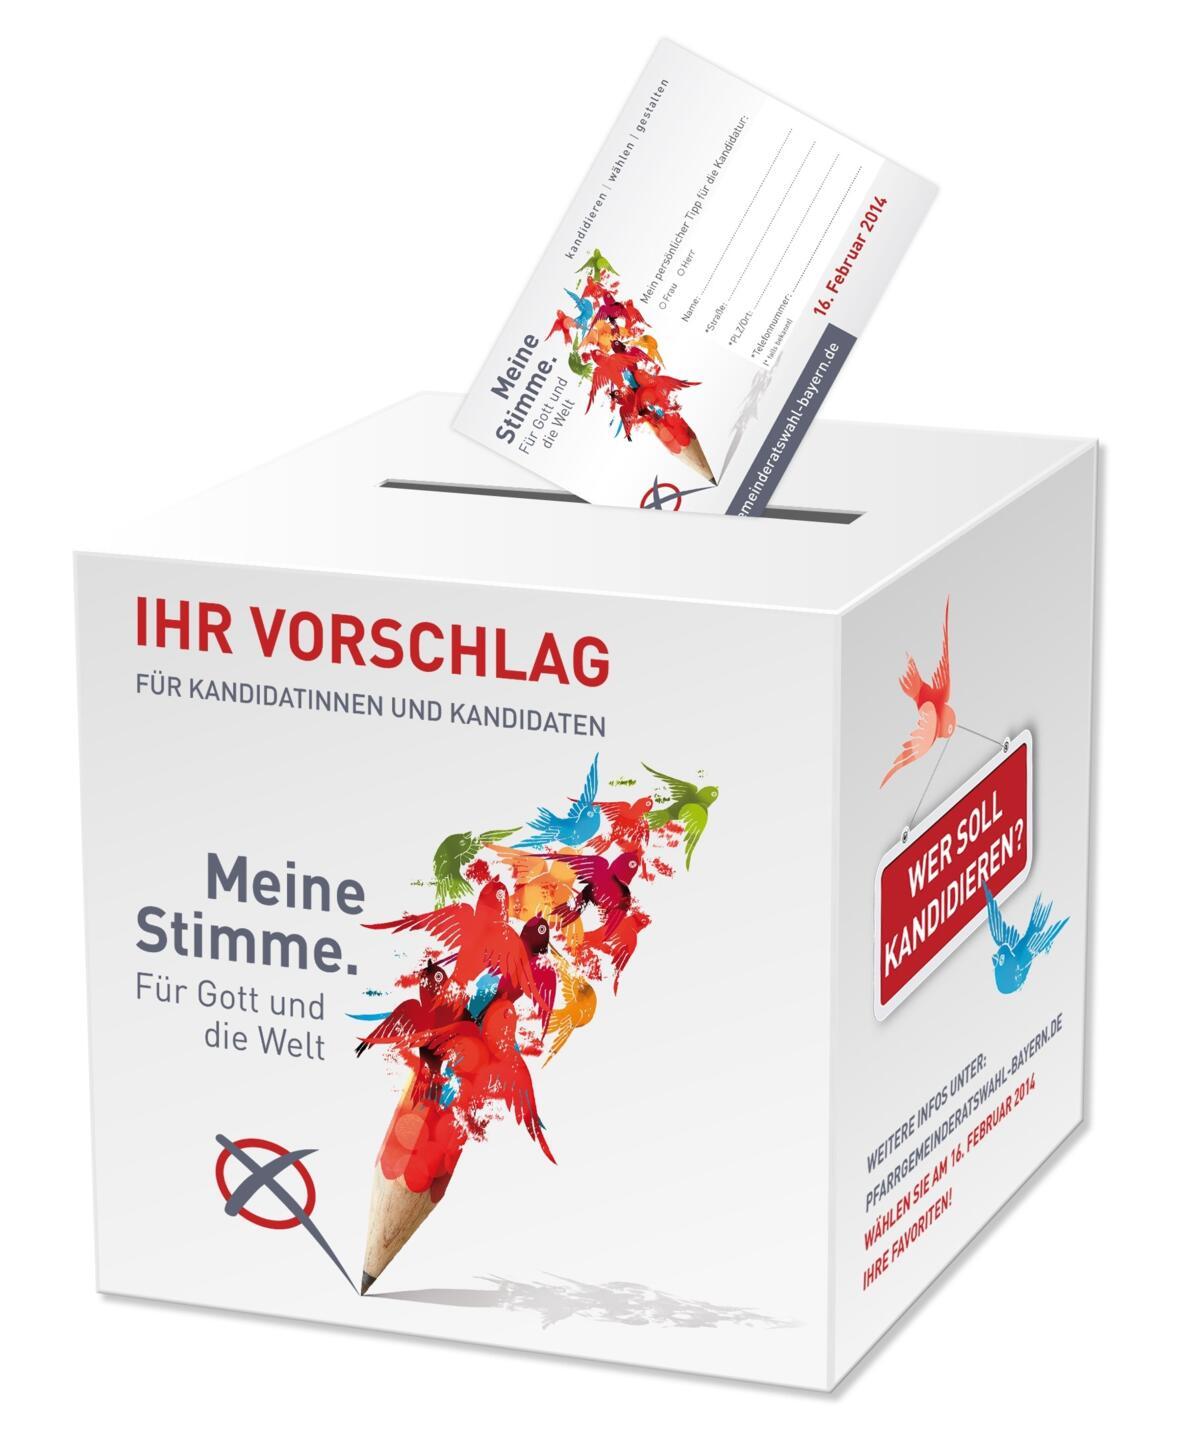 PGR-Wahl Kandidatenbox